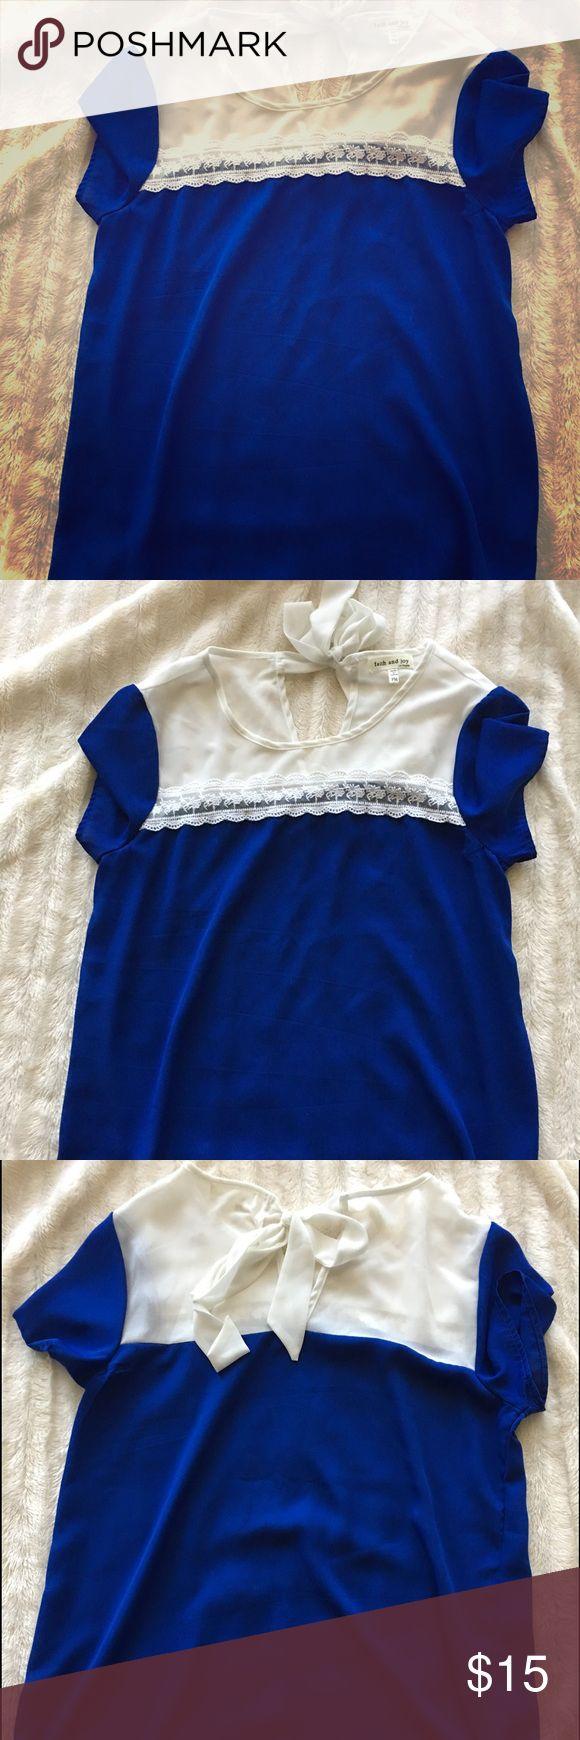 Blue and white blouse Blue and white blouse Tops Blouses